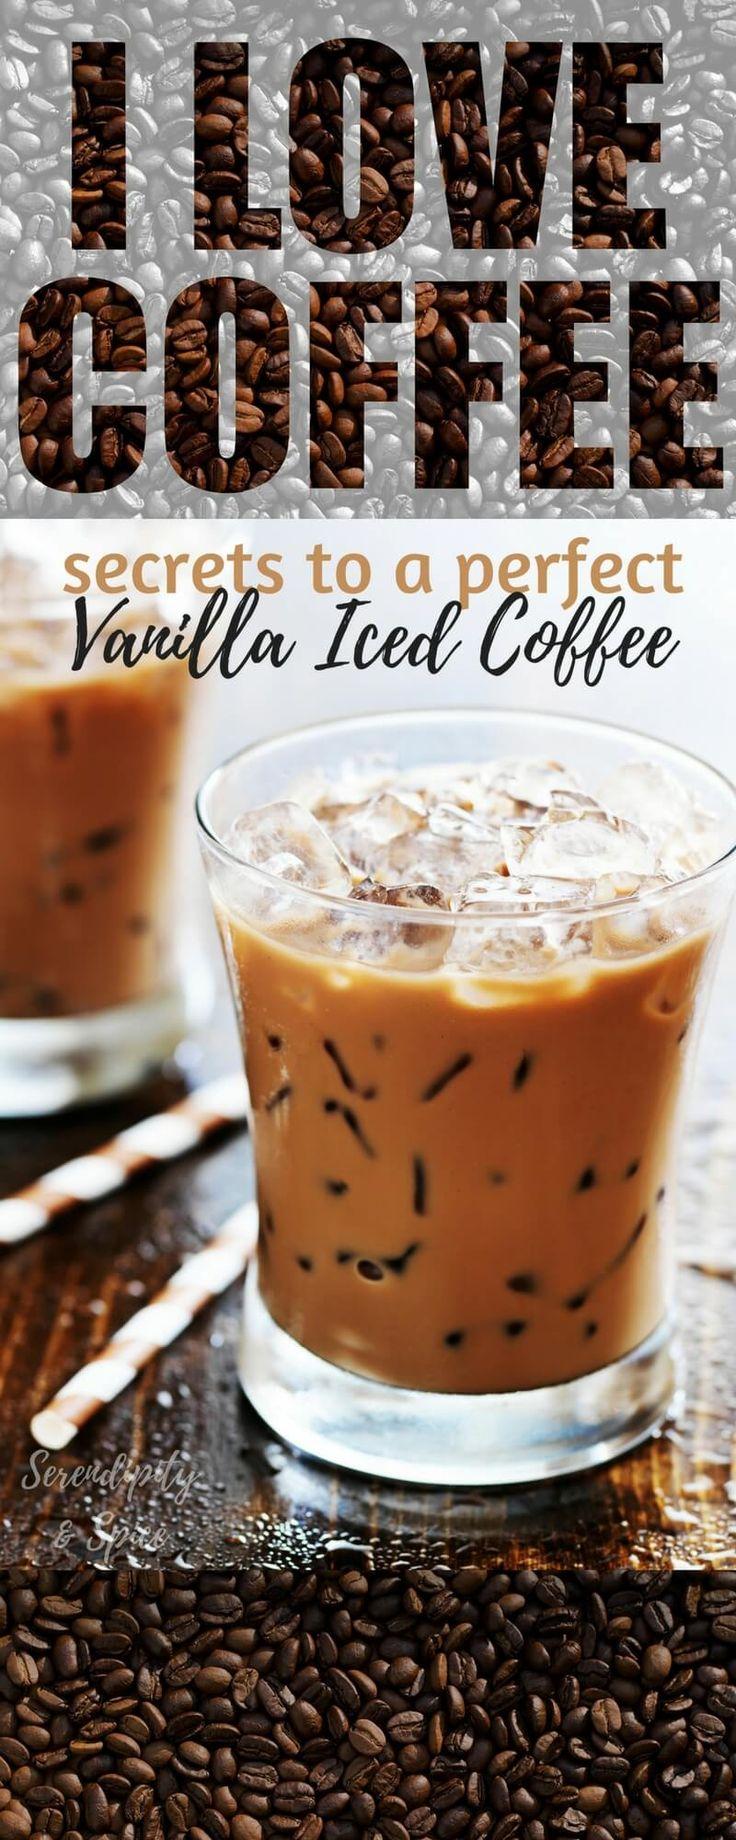 7 Secrets to Perfect Iced Coffee | Recipe | Food | Coffee ...